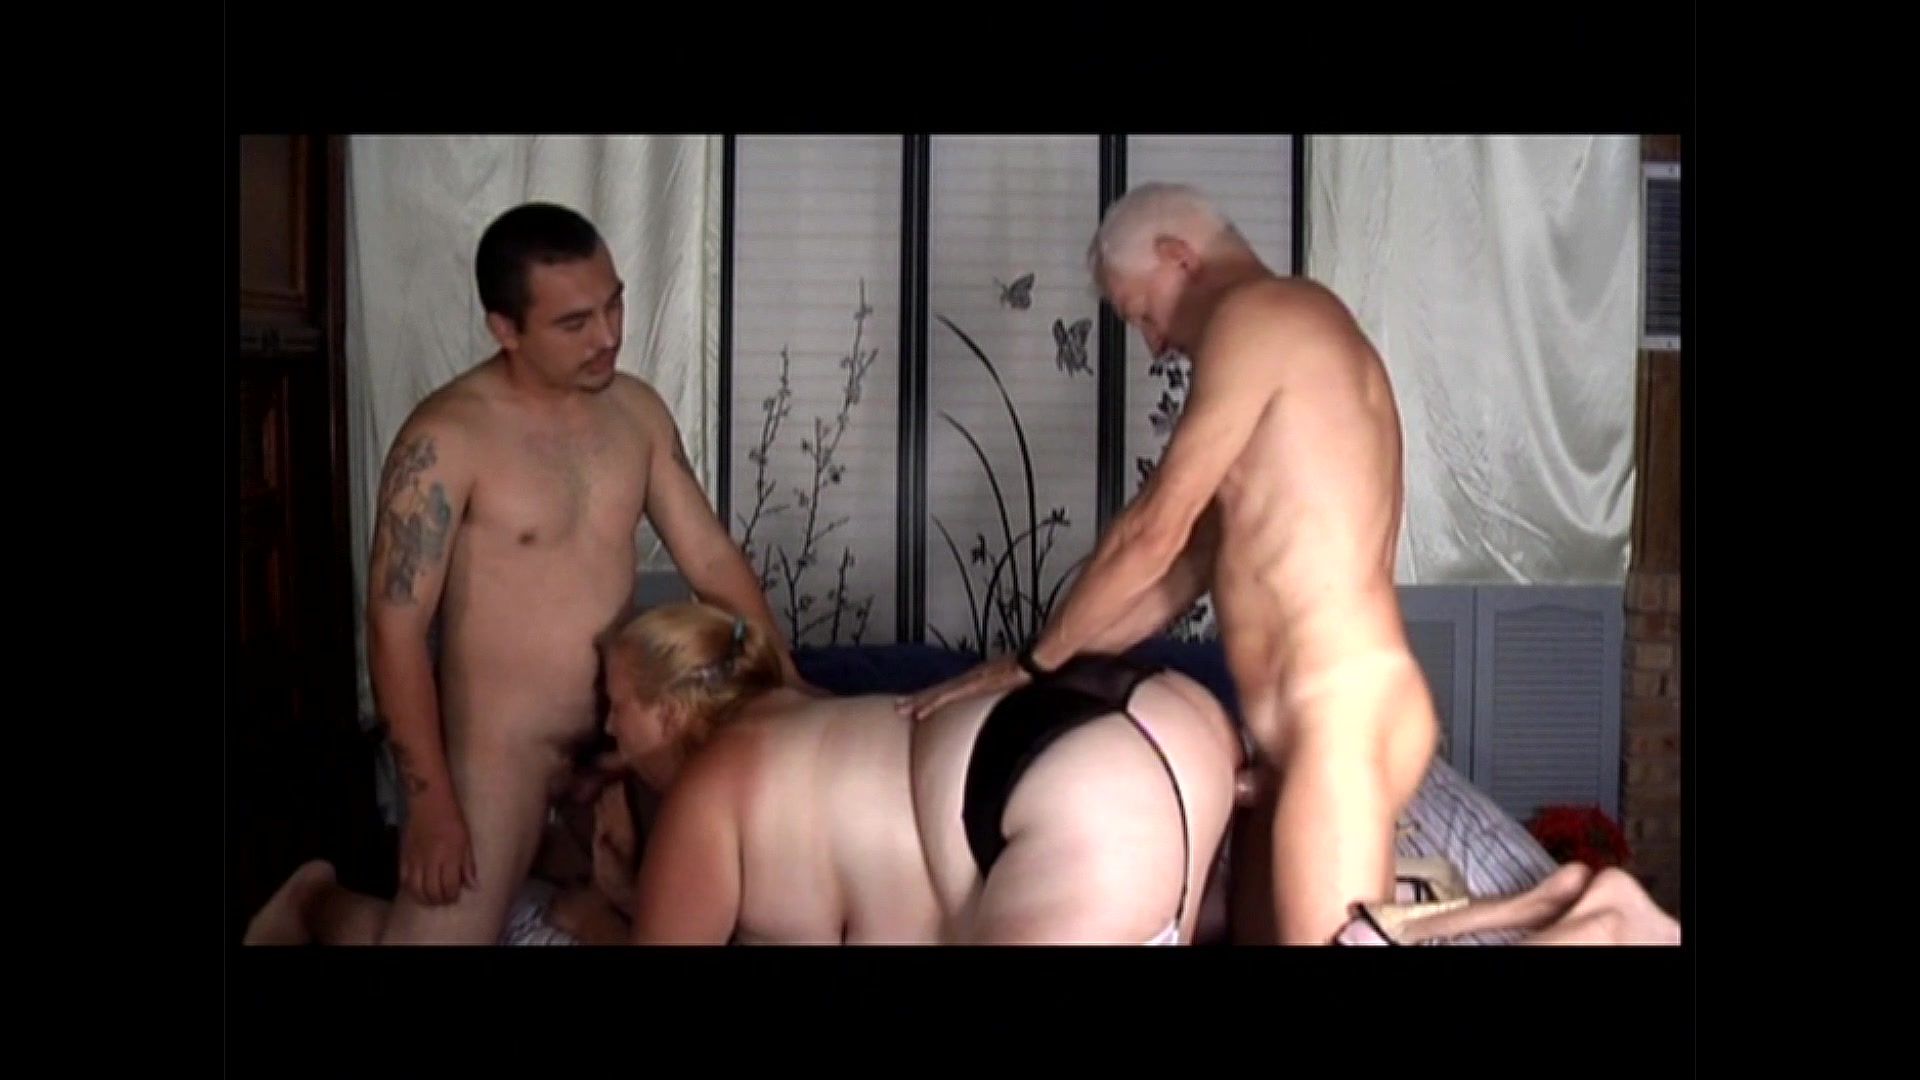 Mature bisexual porn